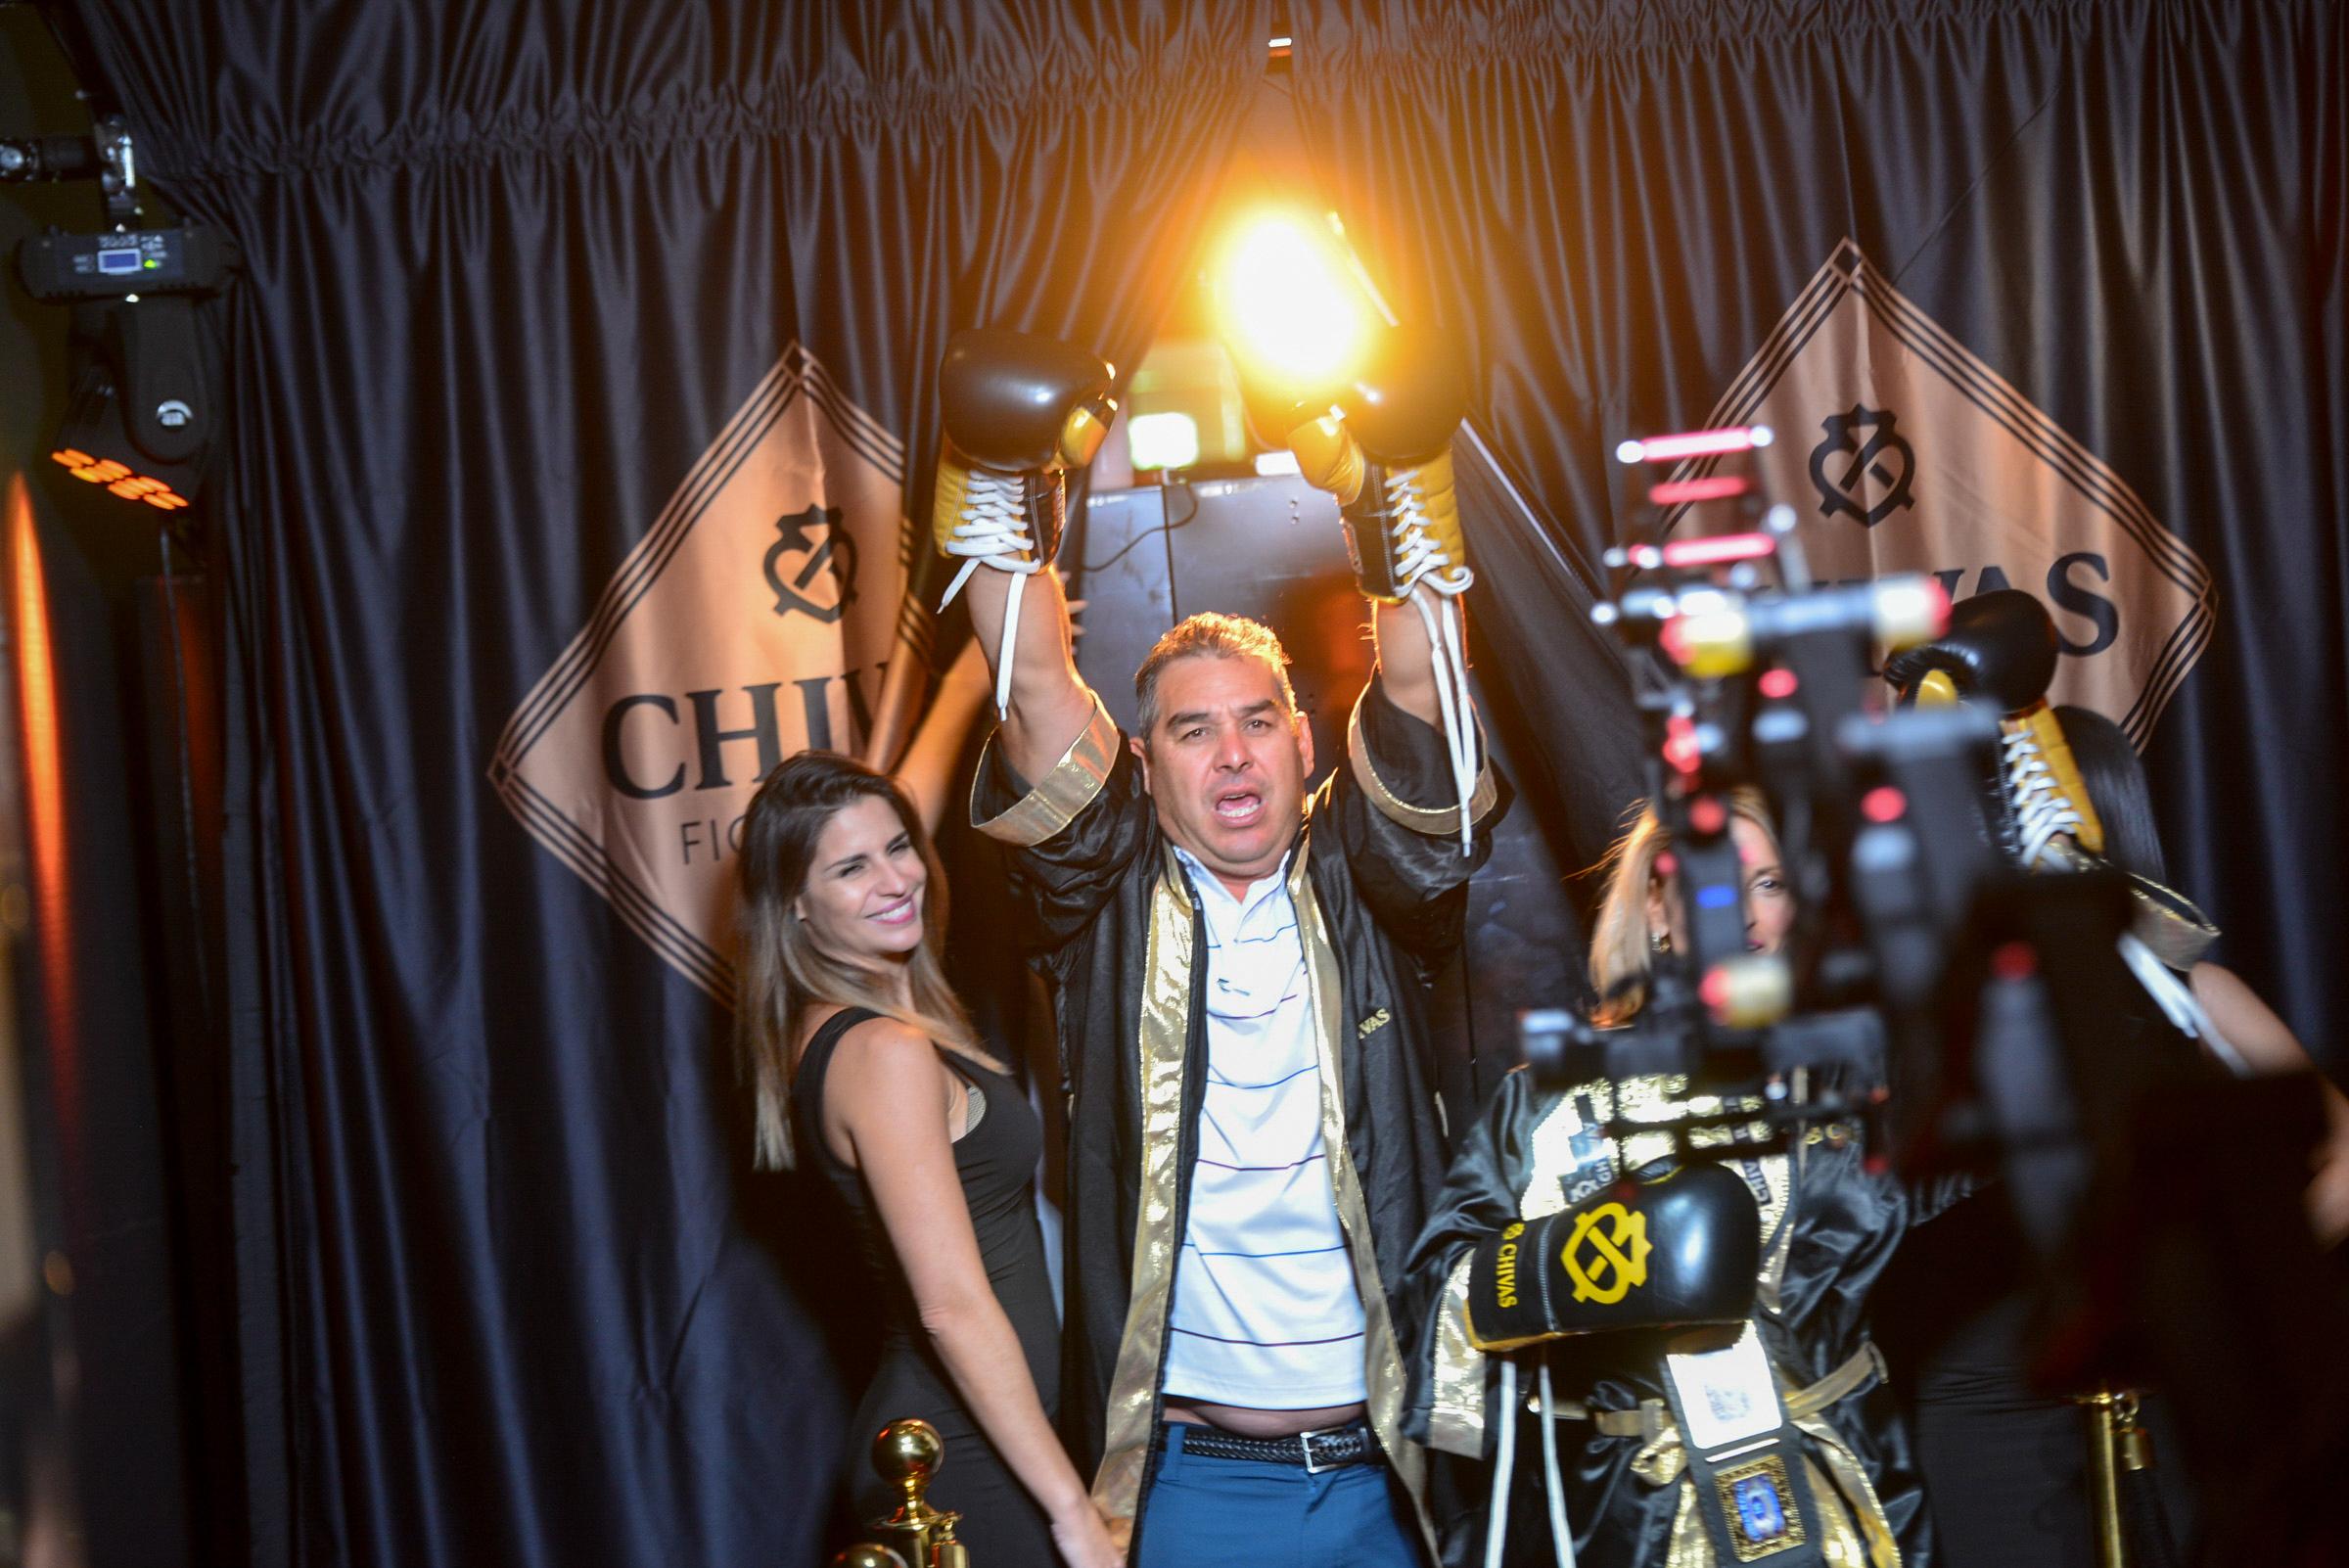 OHM-Chivas-GGG-Vegas-Top Selects-5549.jpg